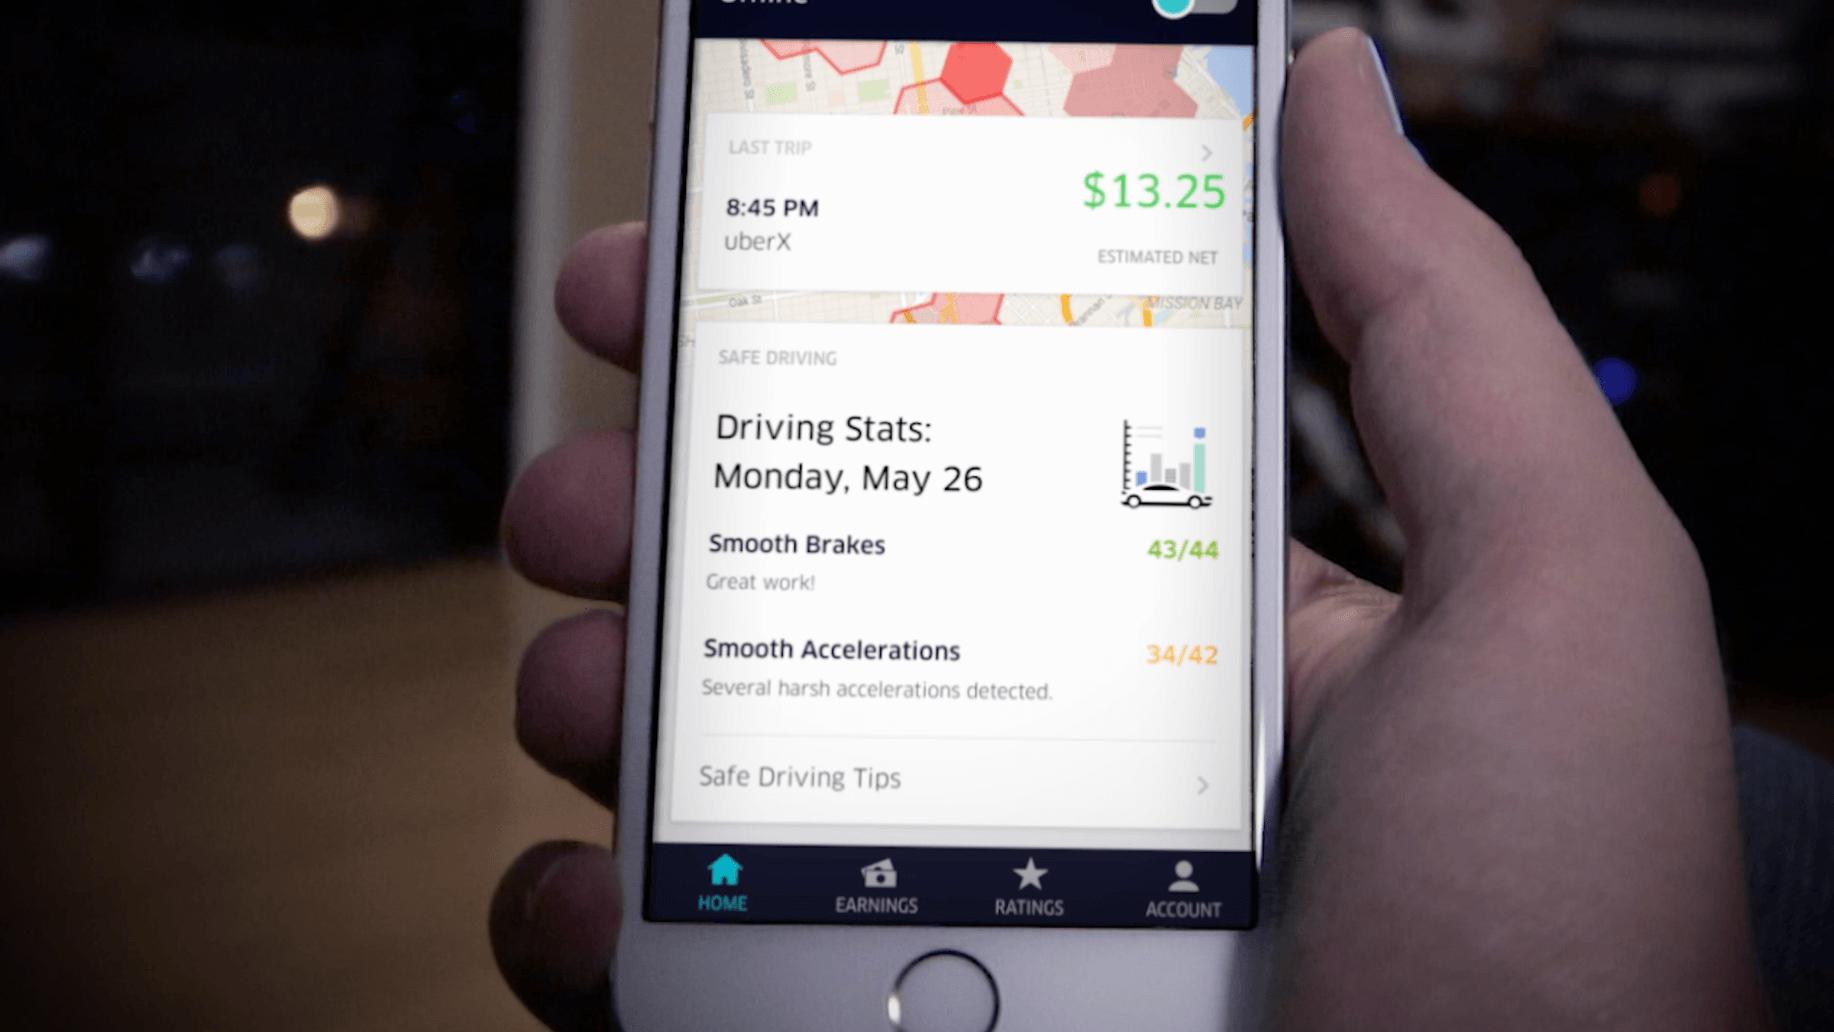 uber-2-copy.jpg